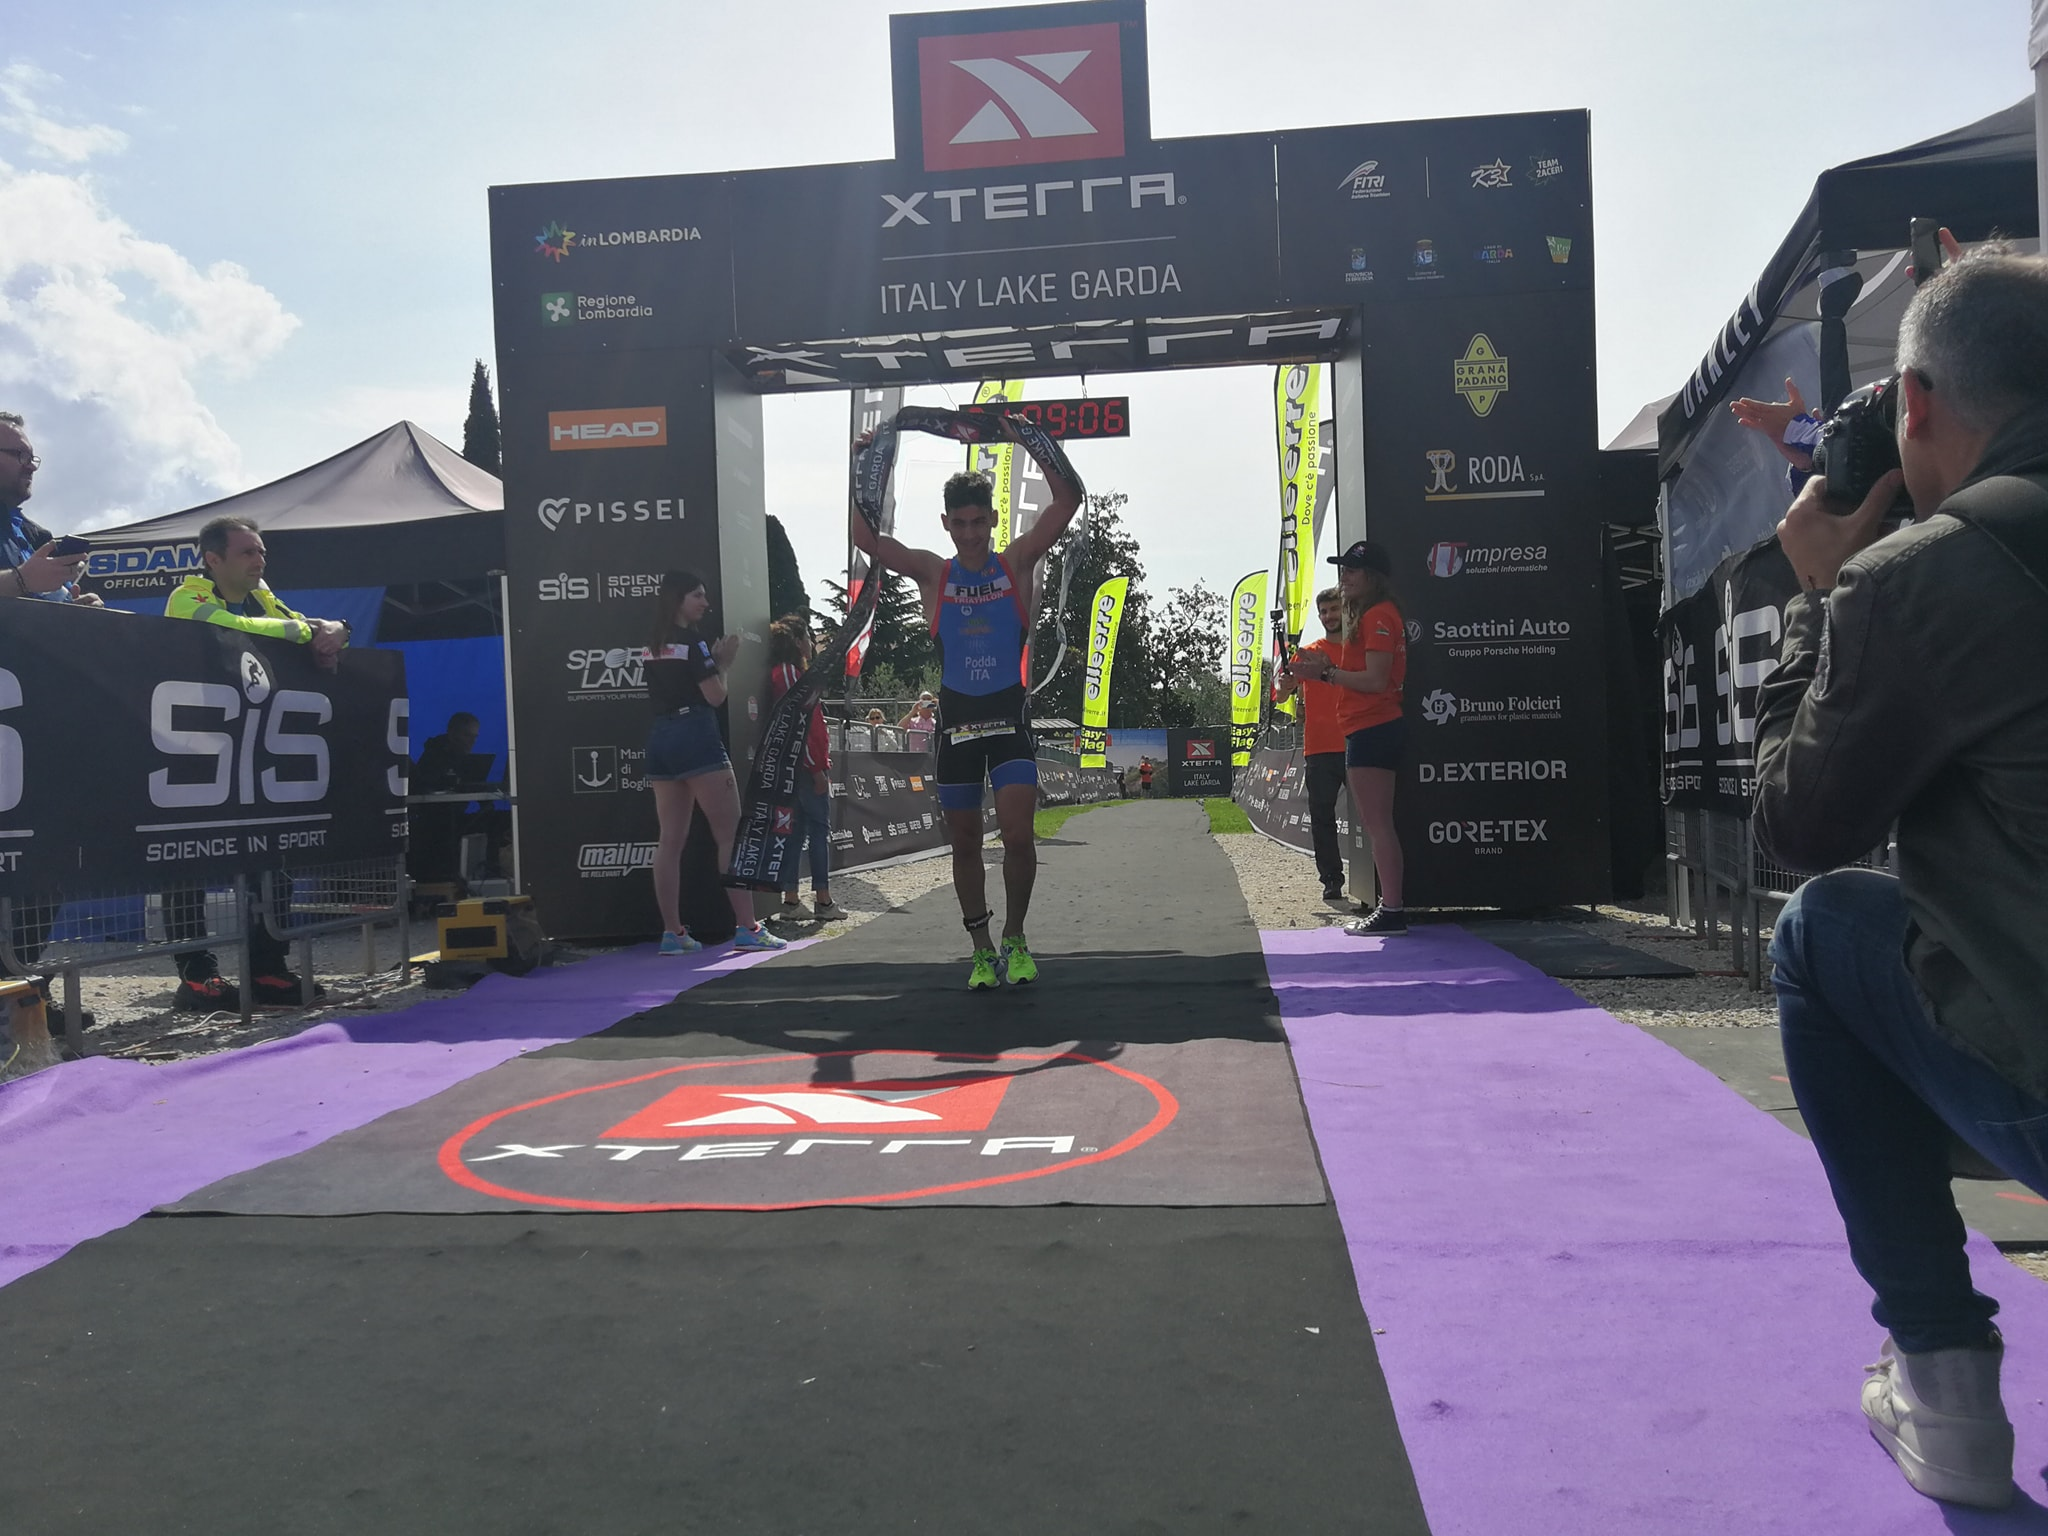 Francesco Podda vince l'XTERRA Italy Lake Garda Triathlon Sprint